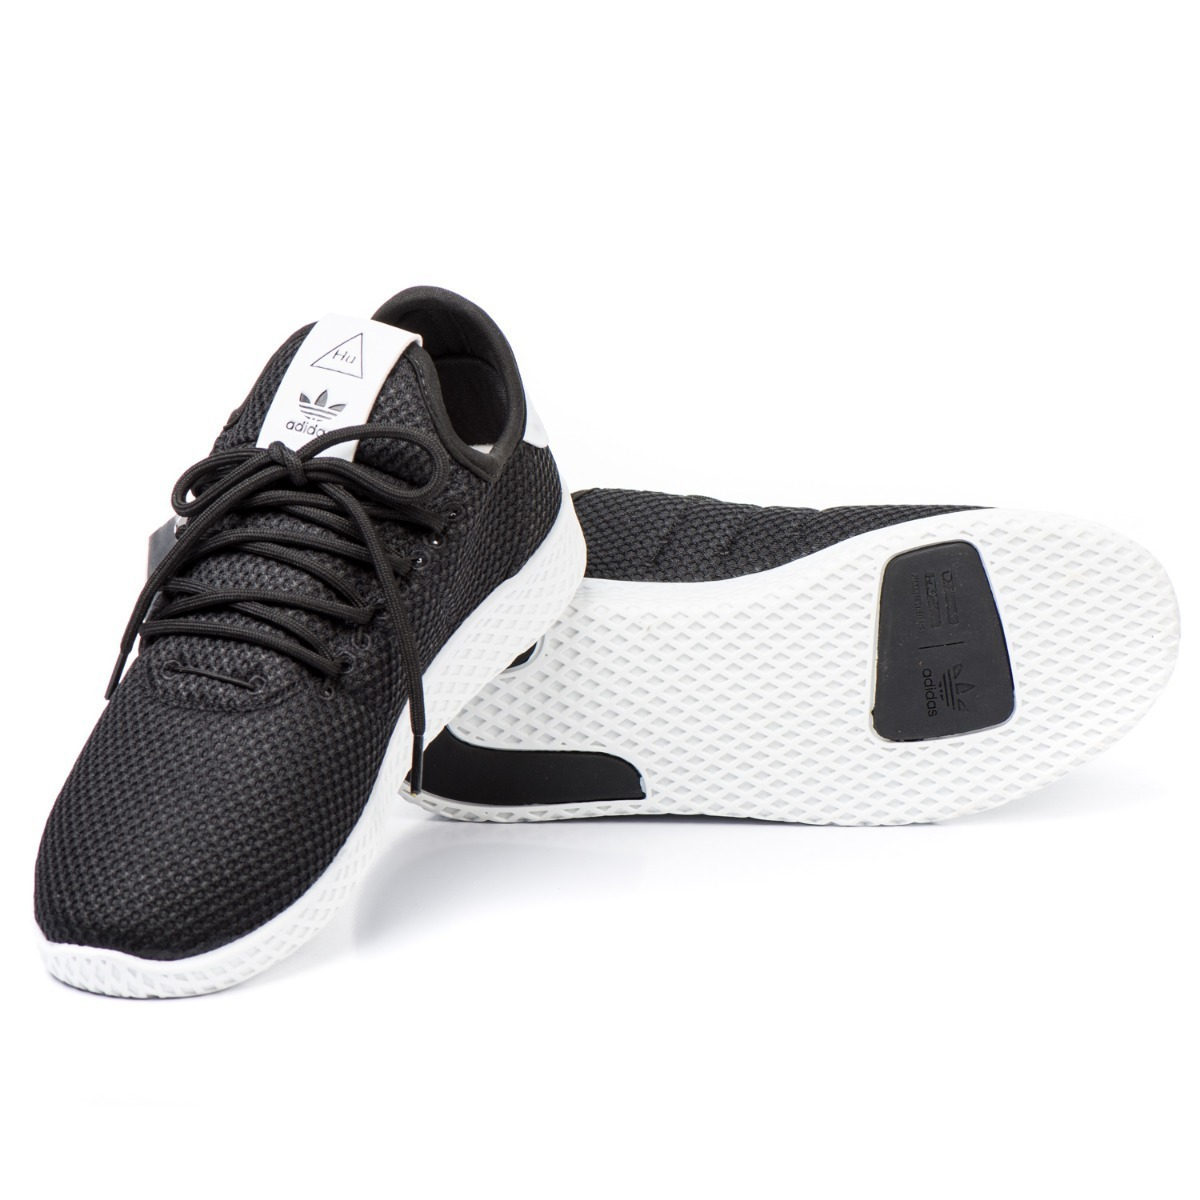 tênis adidas pharrel williams hu masculino feminino original · tênis adidas  masculino. Carregando zoom. b186fdc04f799